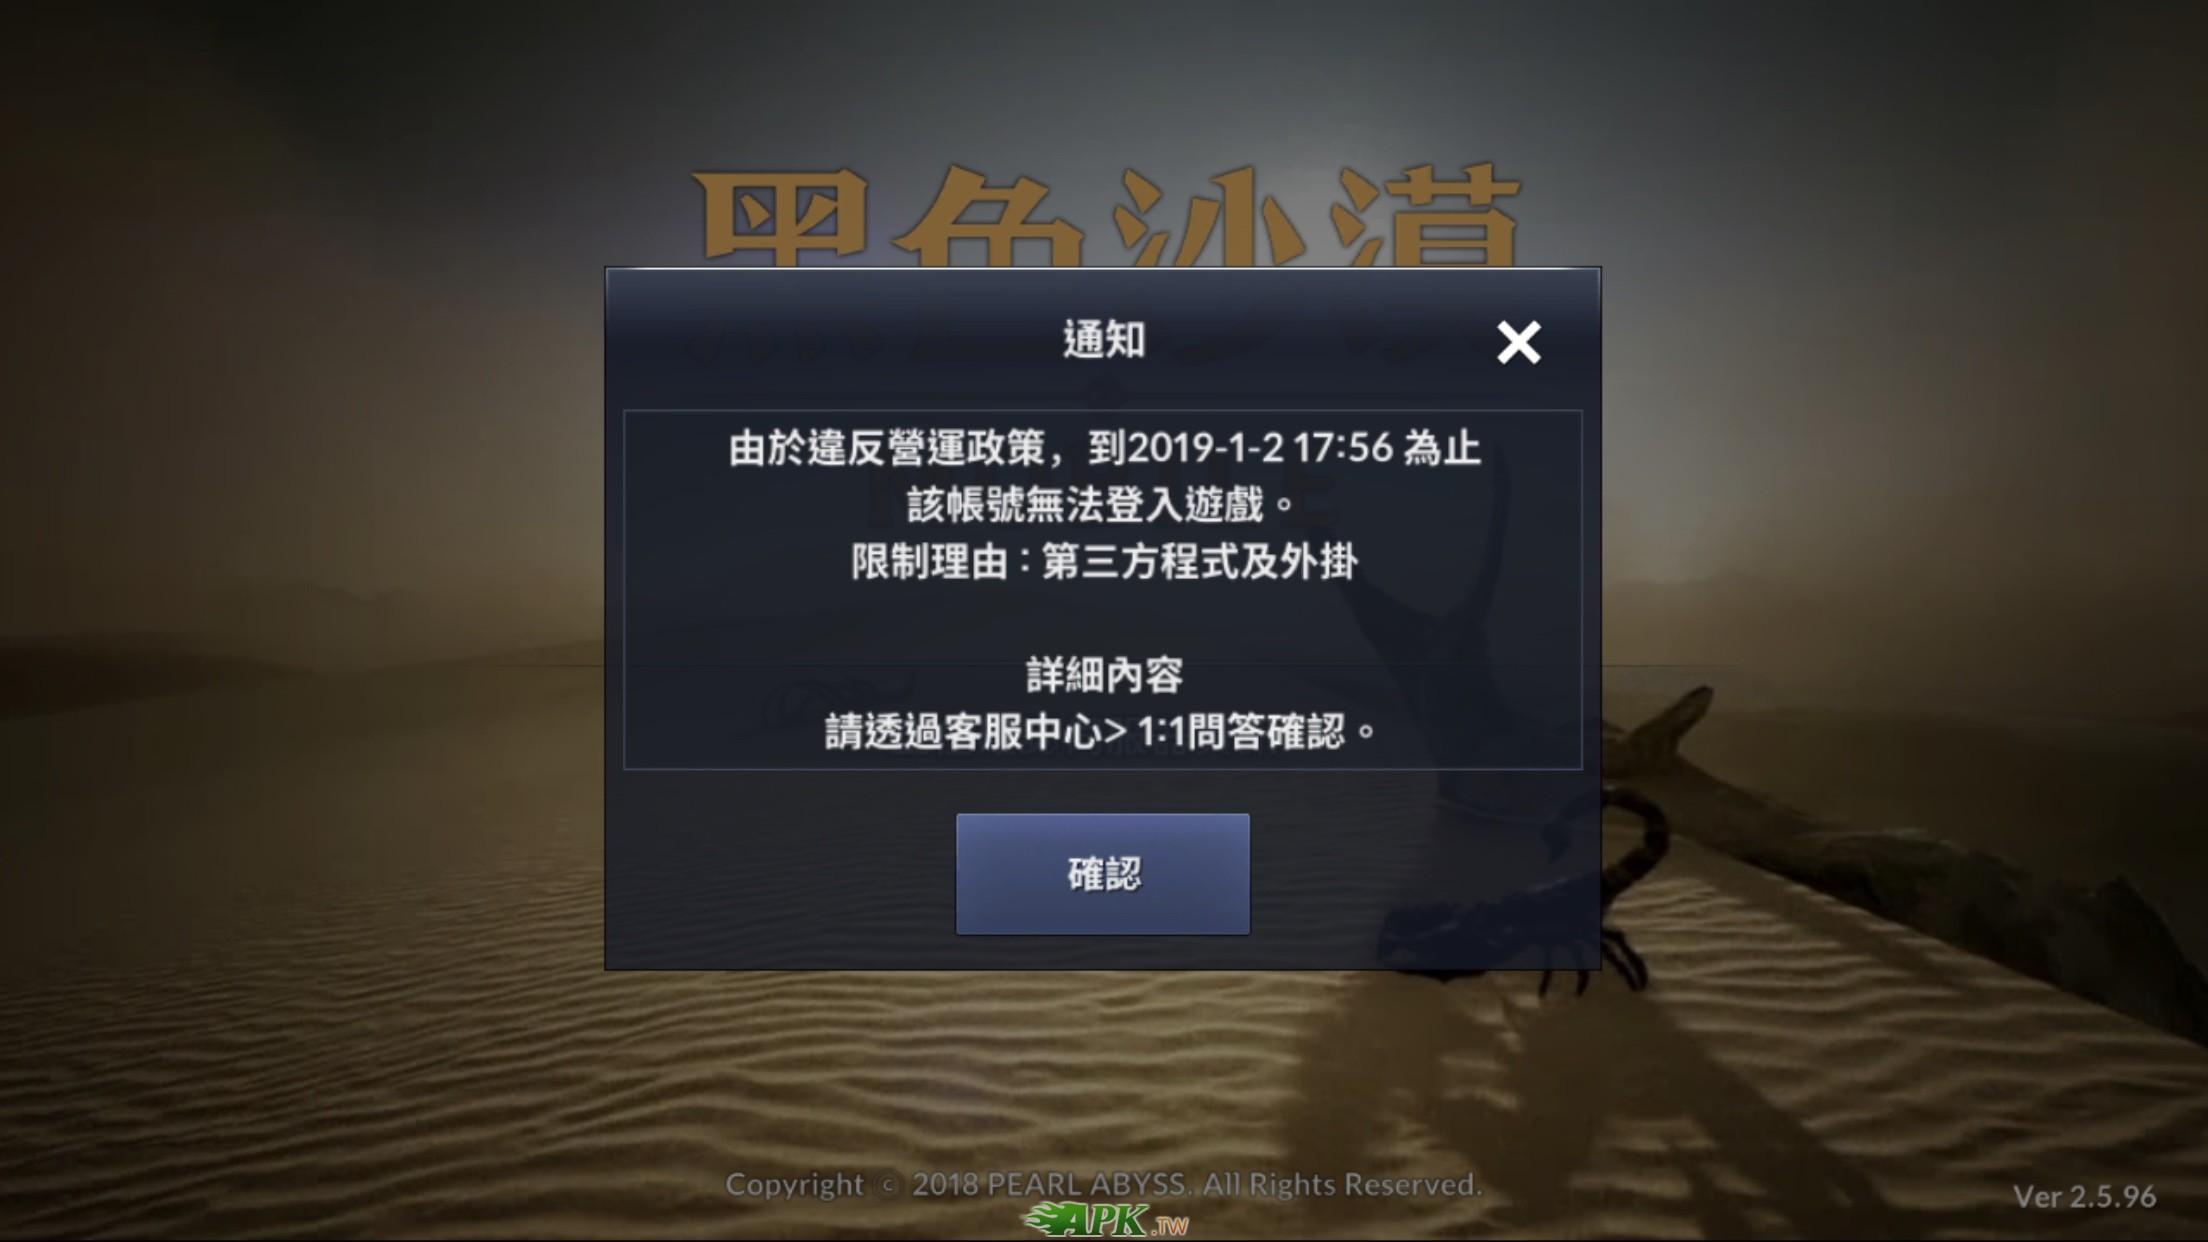 170CC2C8-AC3F-475D-A826-7716D8BD9290.jpg